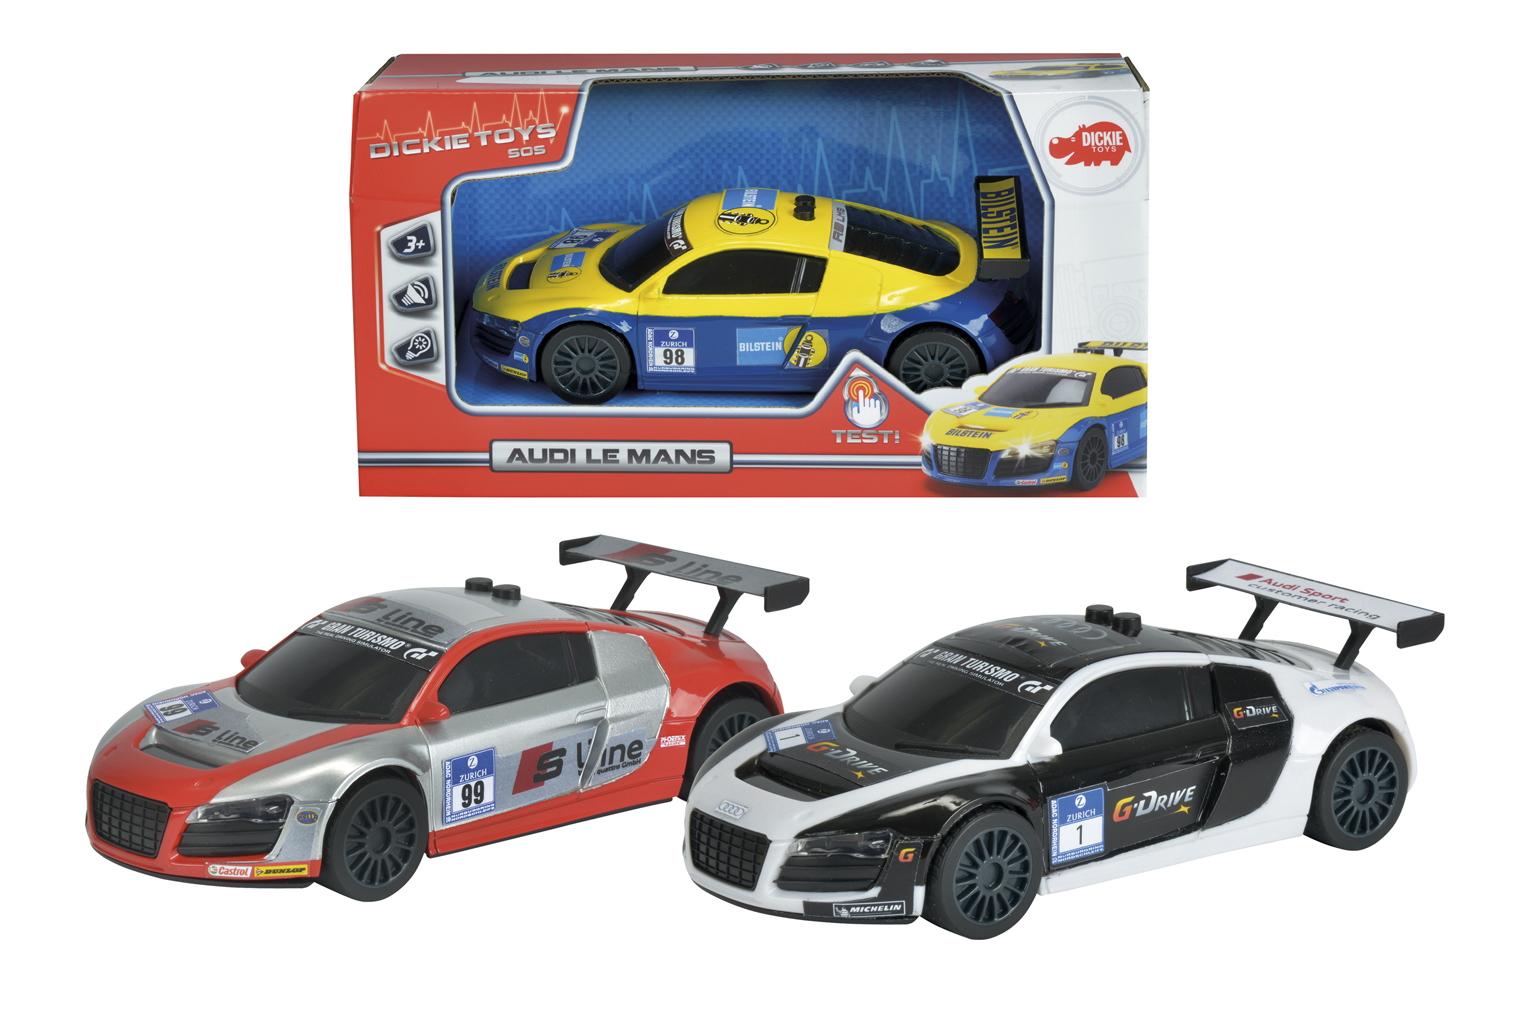 Гоночная машина Audi Le Mans, 19 см., масштаб 1:24, 3 видаAudi<br>Гоночная машина Audi Le Mans, 19 см., масштаб 1:24, 3 вида<br>